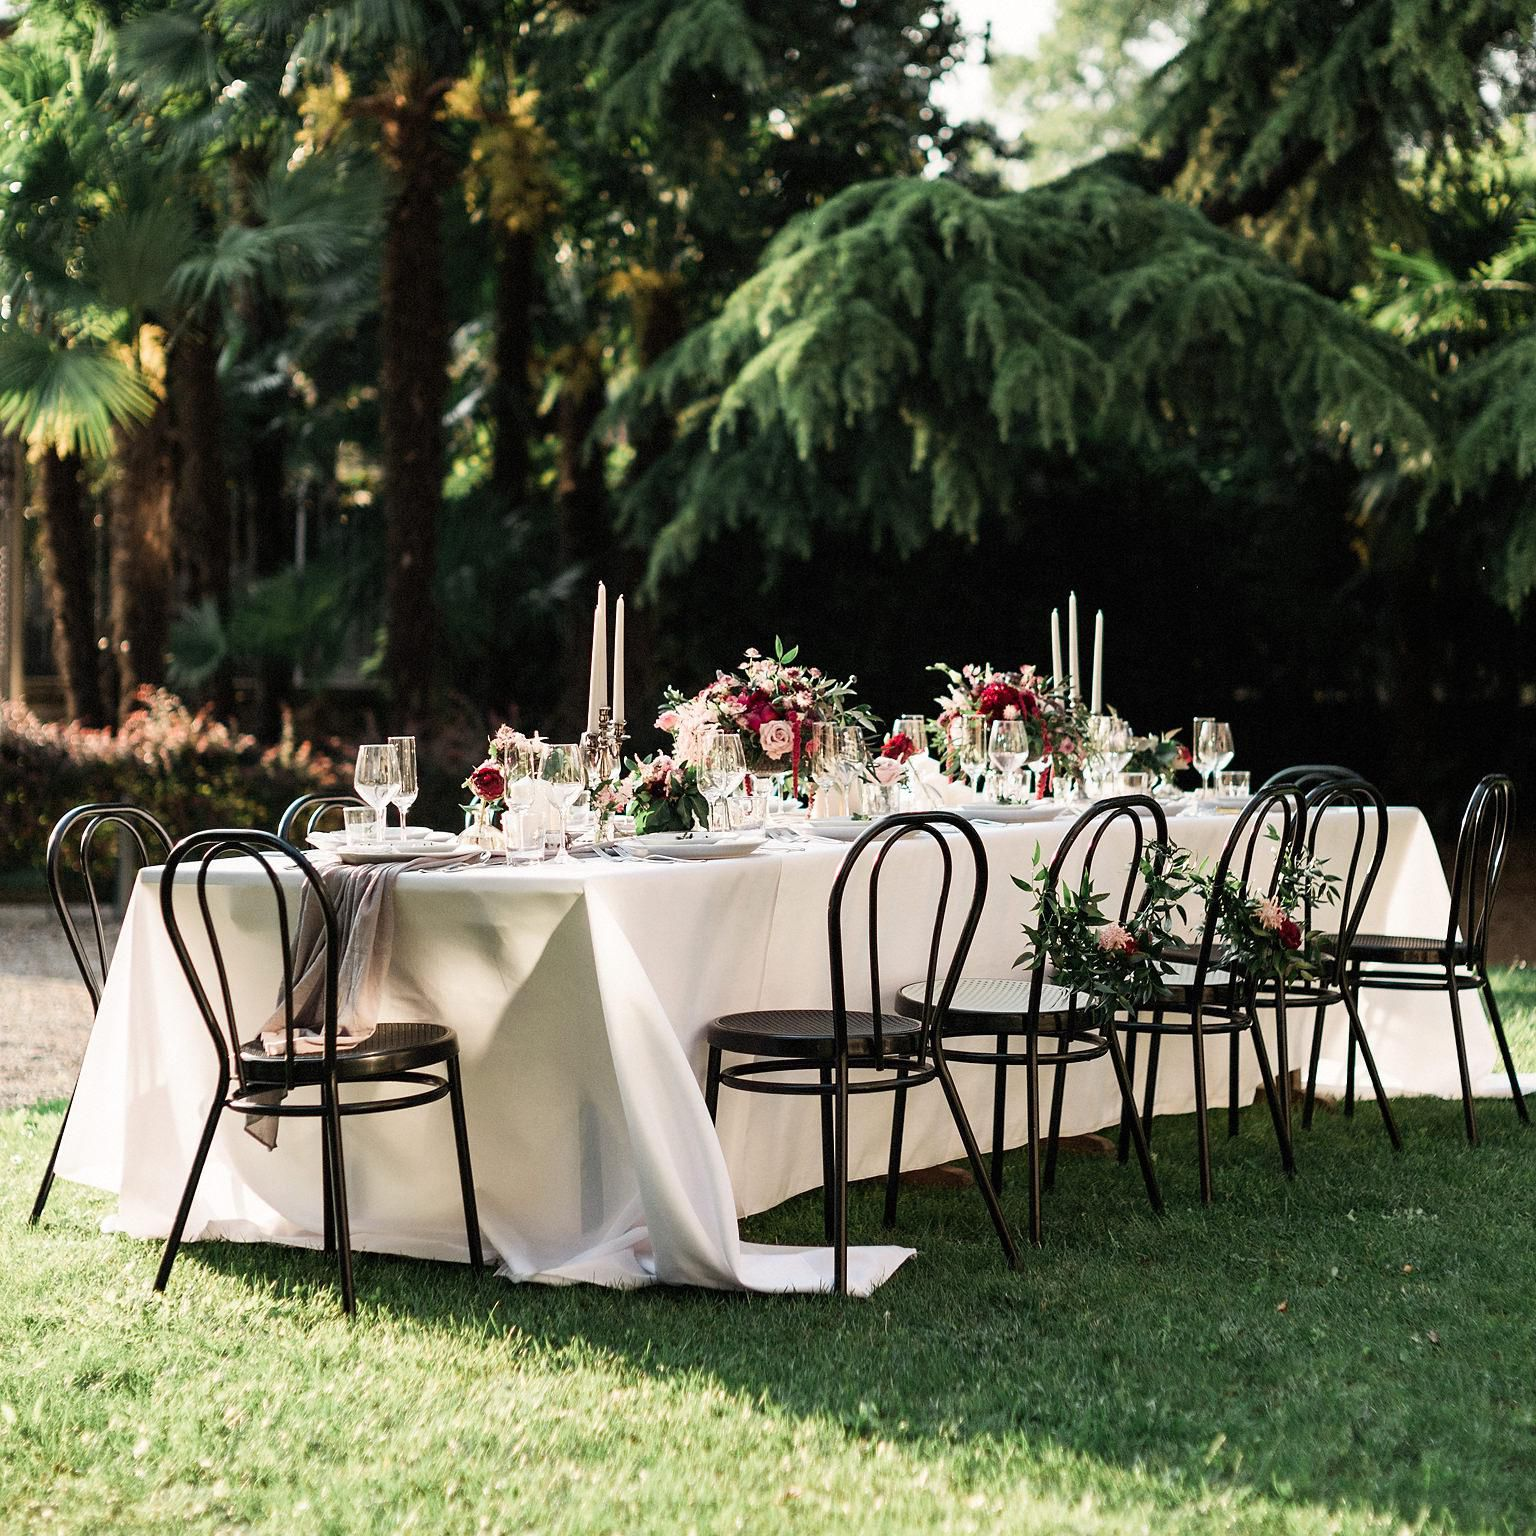 Backyard Wedding Decorations Small Wedding Ideas At Home